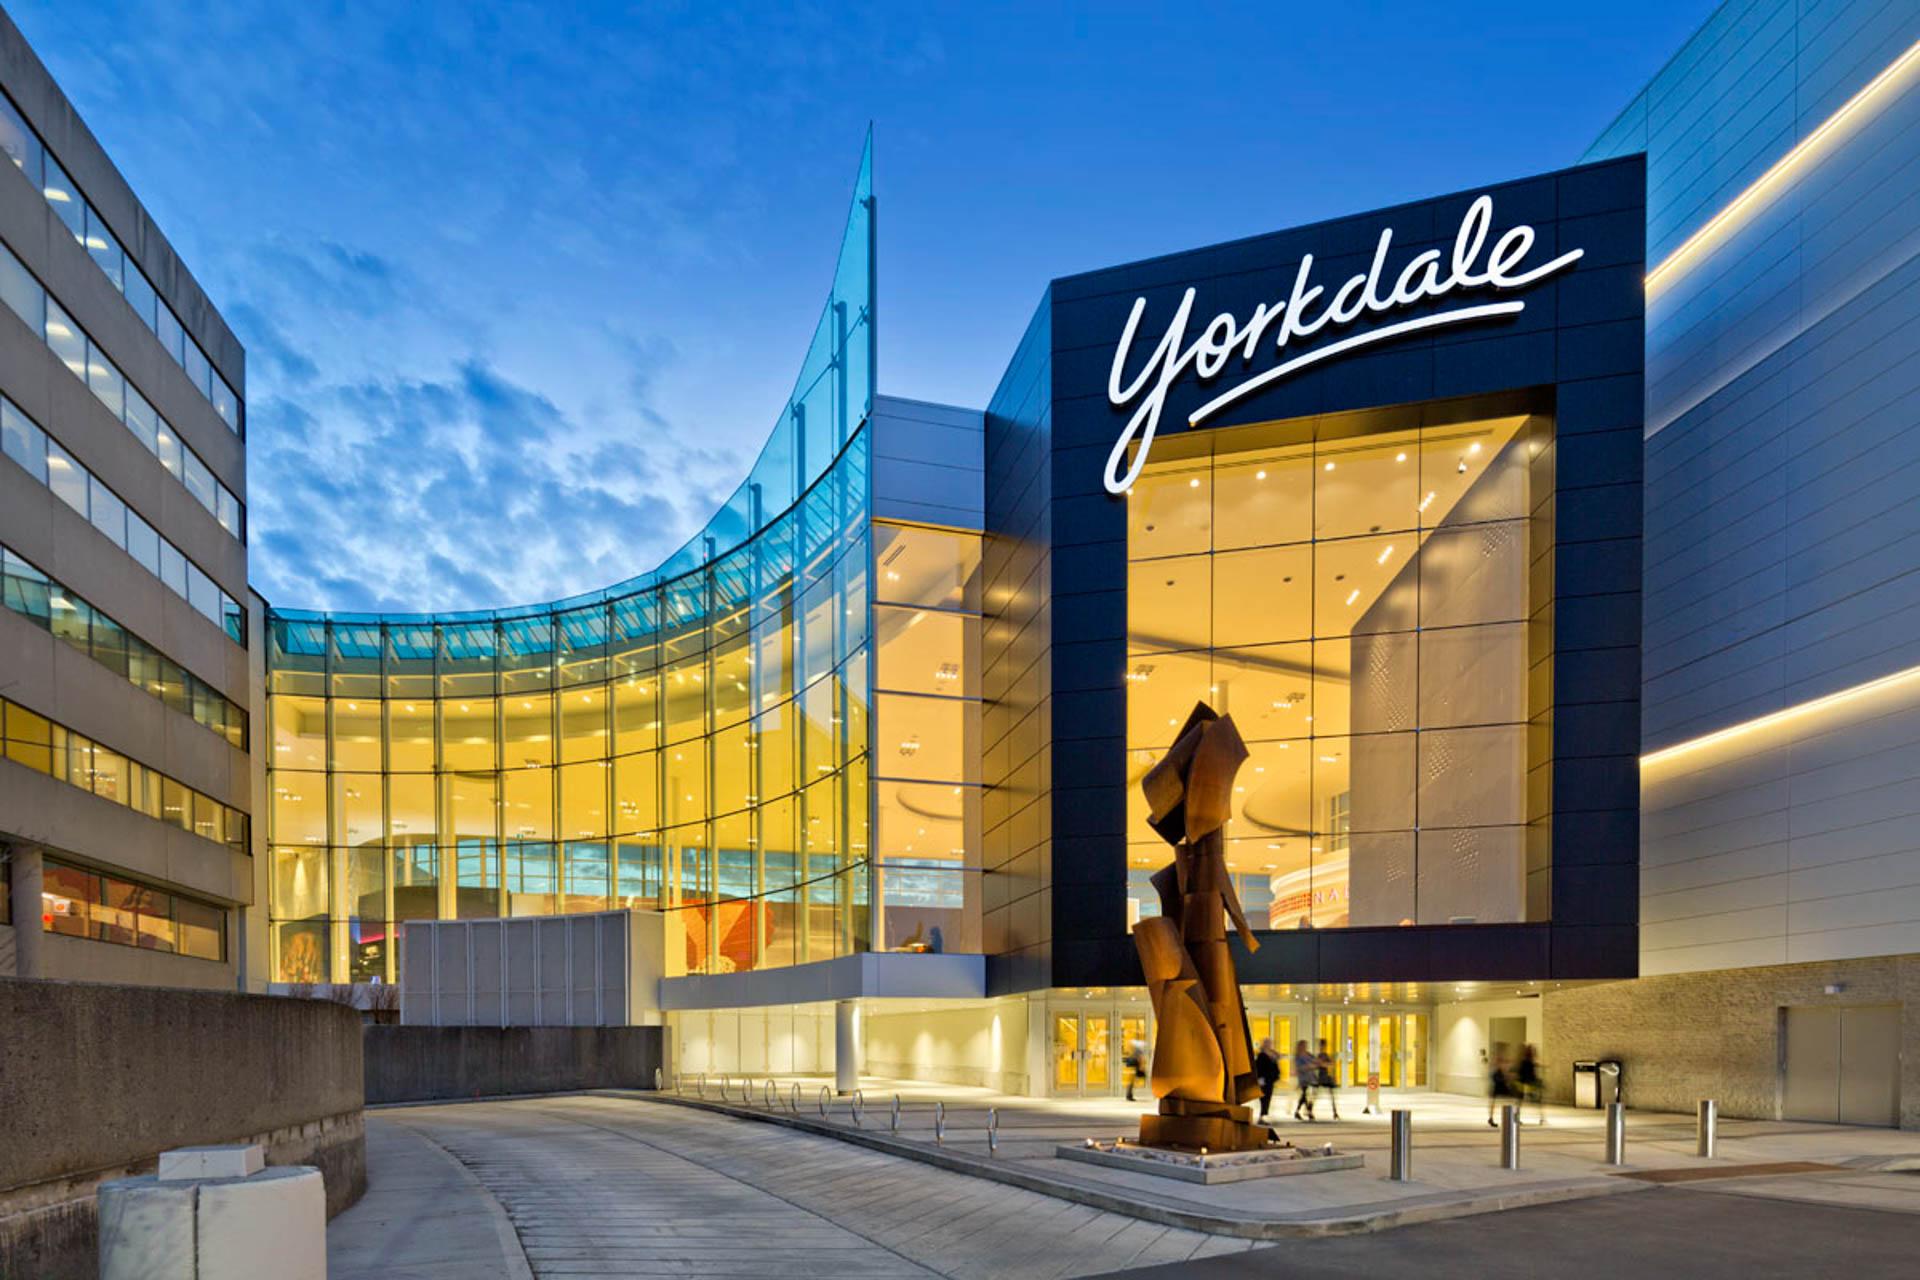 yorkdale-3.jpg